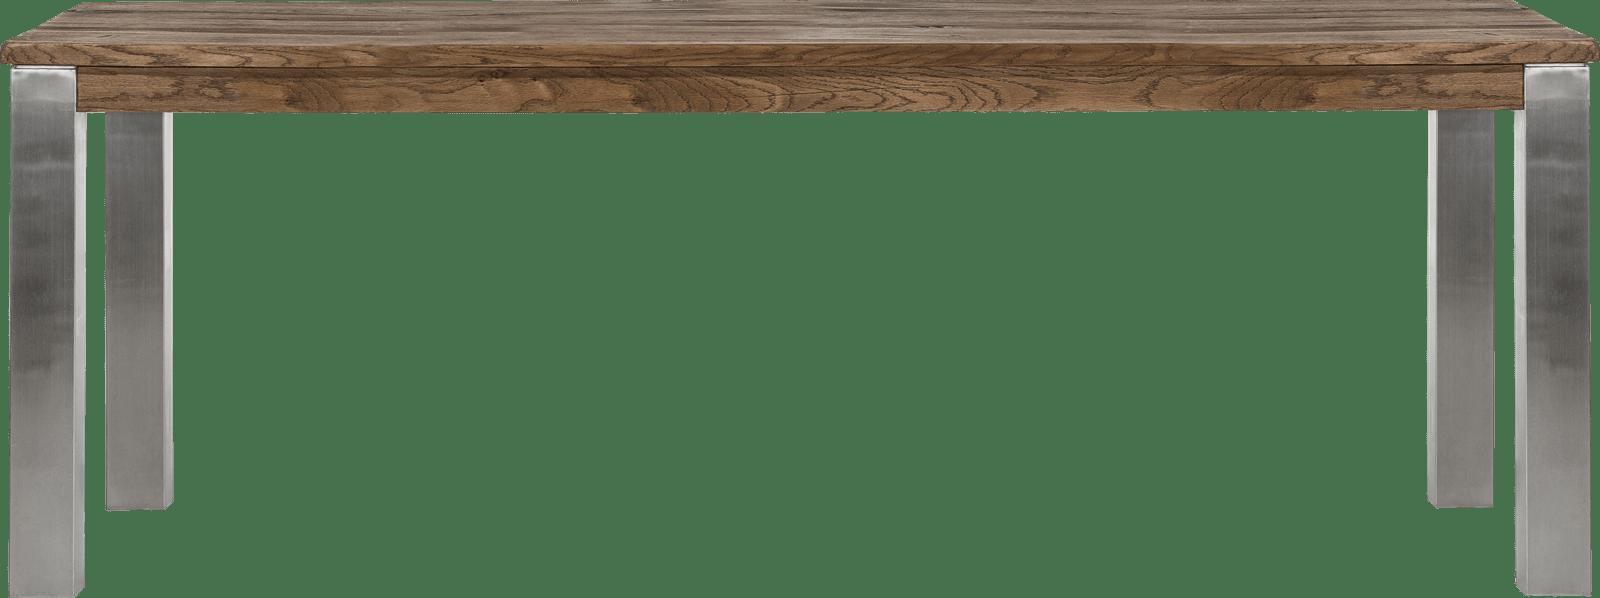 Masters - eetkamertafel 220 x 100 cm - rvs 9x9